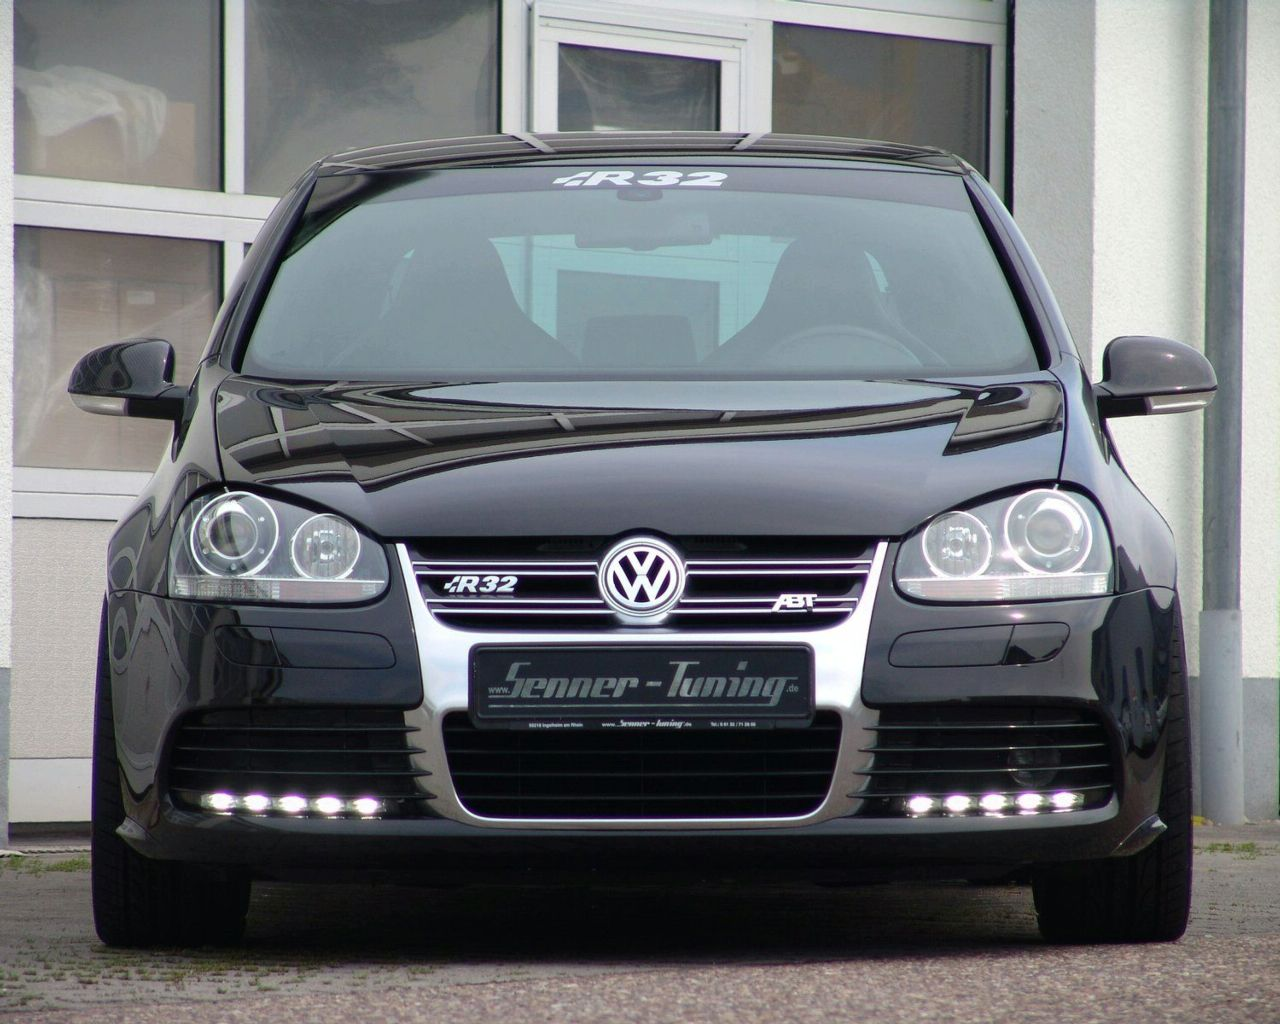 Car Info: VW Golf V R32 by Senner Tuning